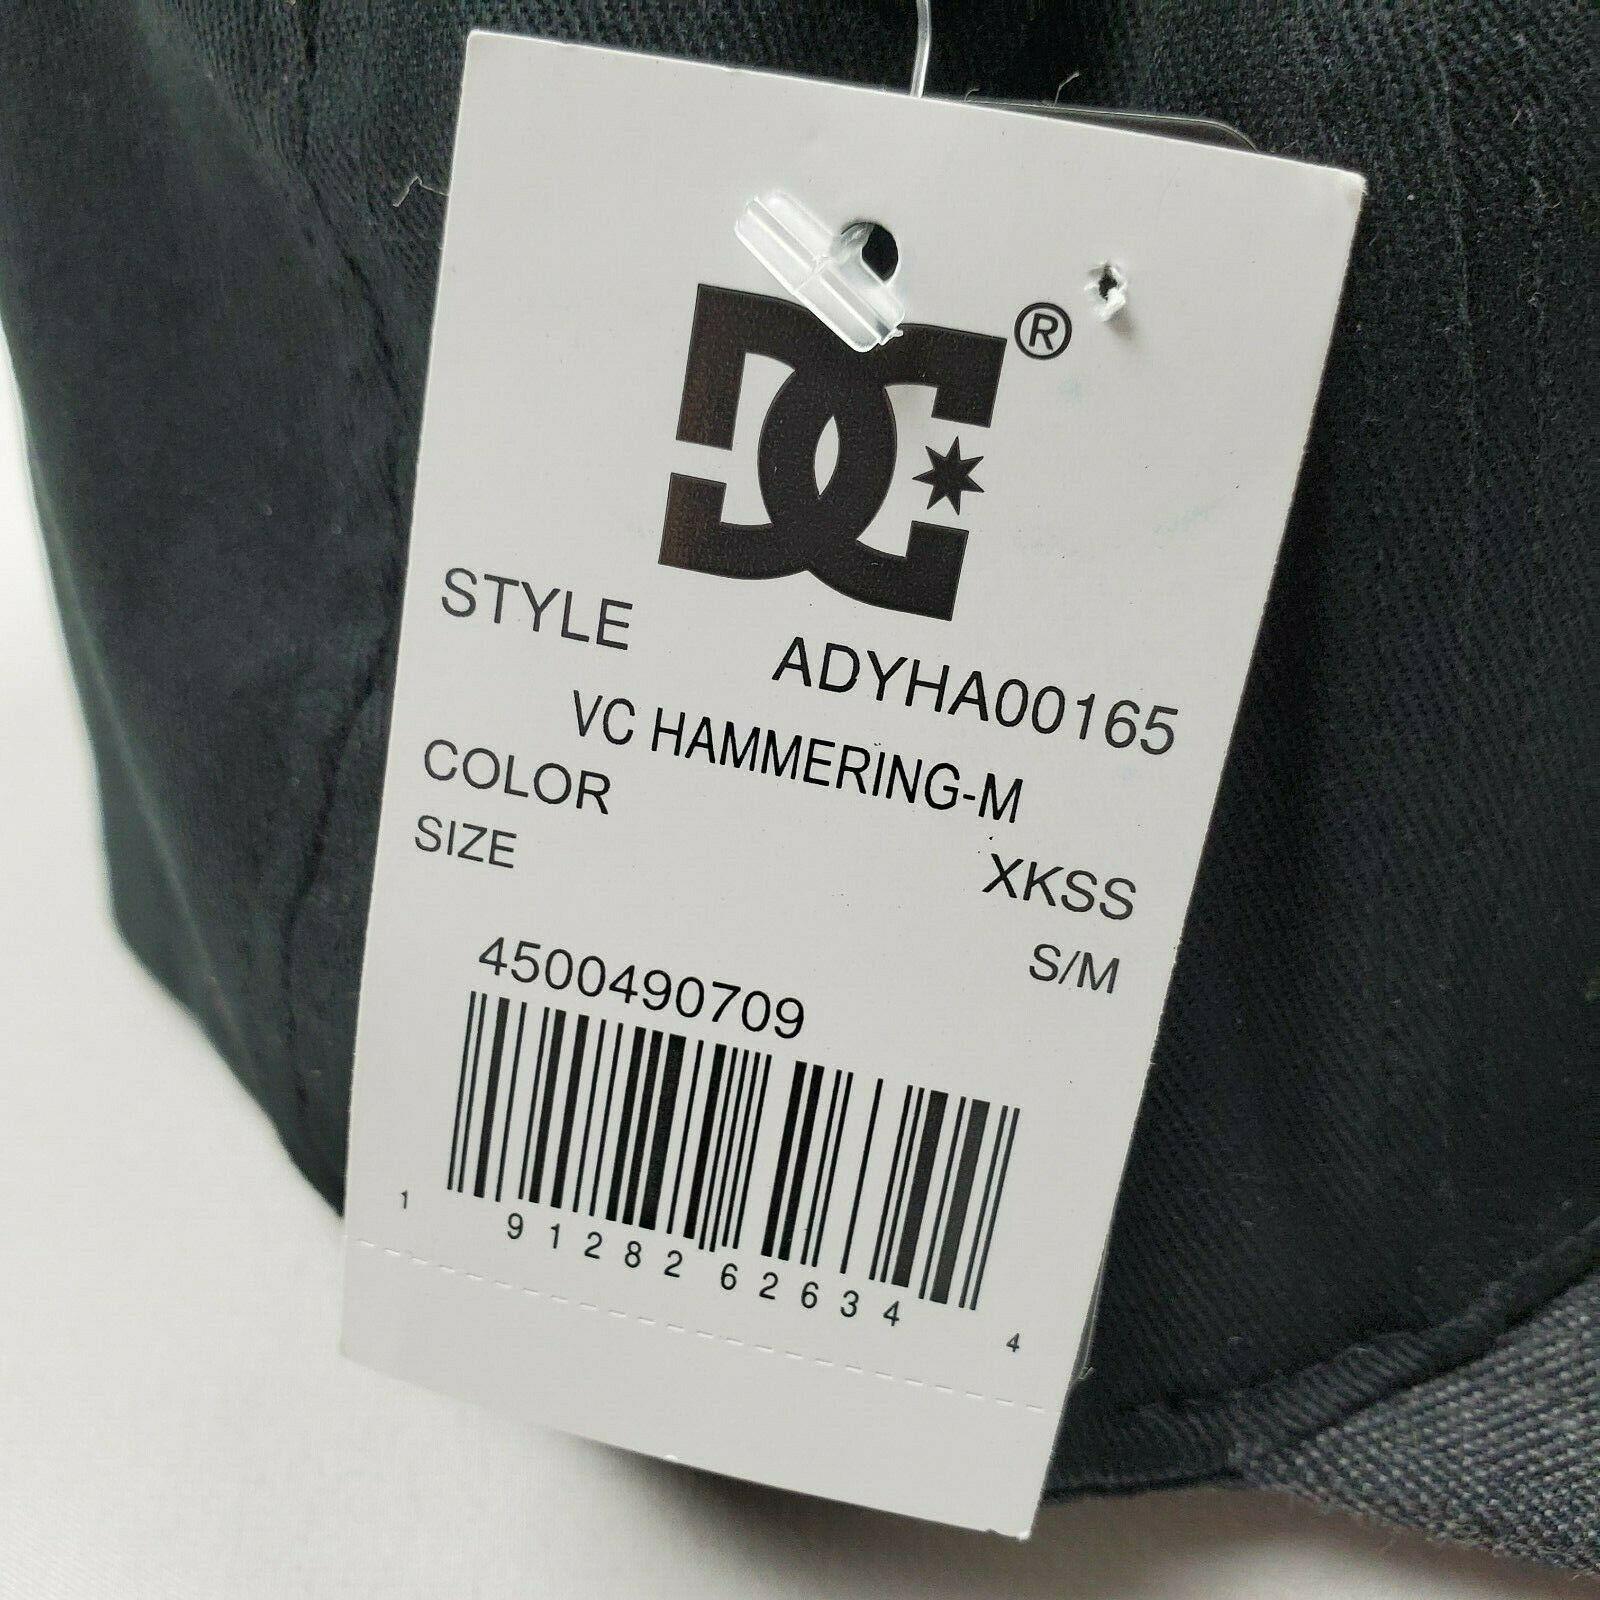 DC Shoes Flexfit Fitted Hammering Black Hat Mens Size S/M